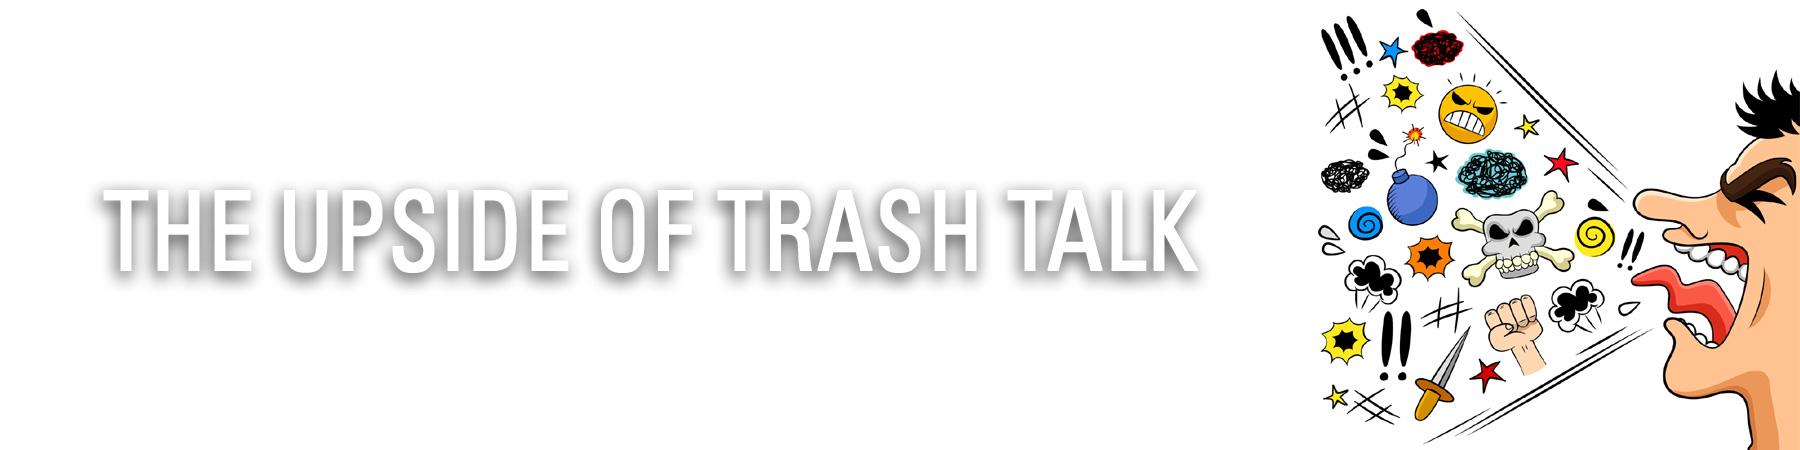 The Upside of Trash Talk